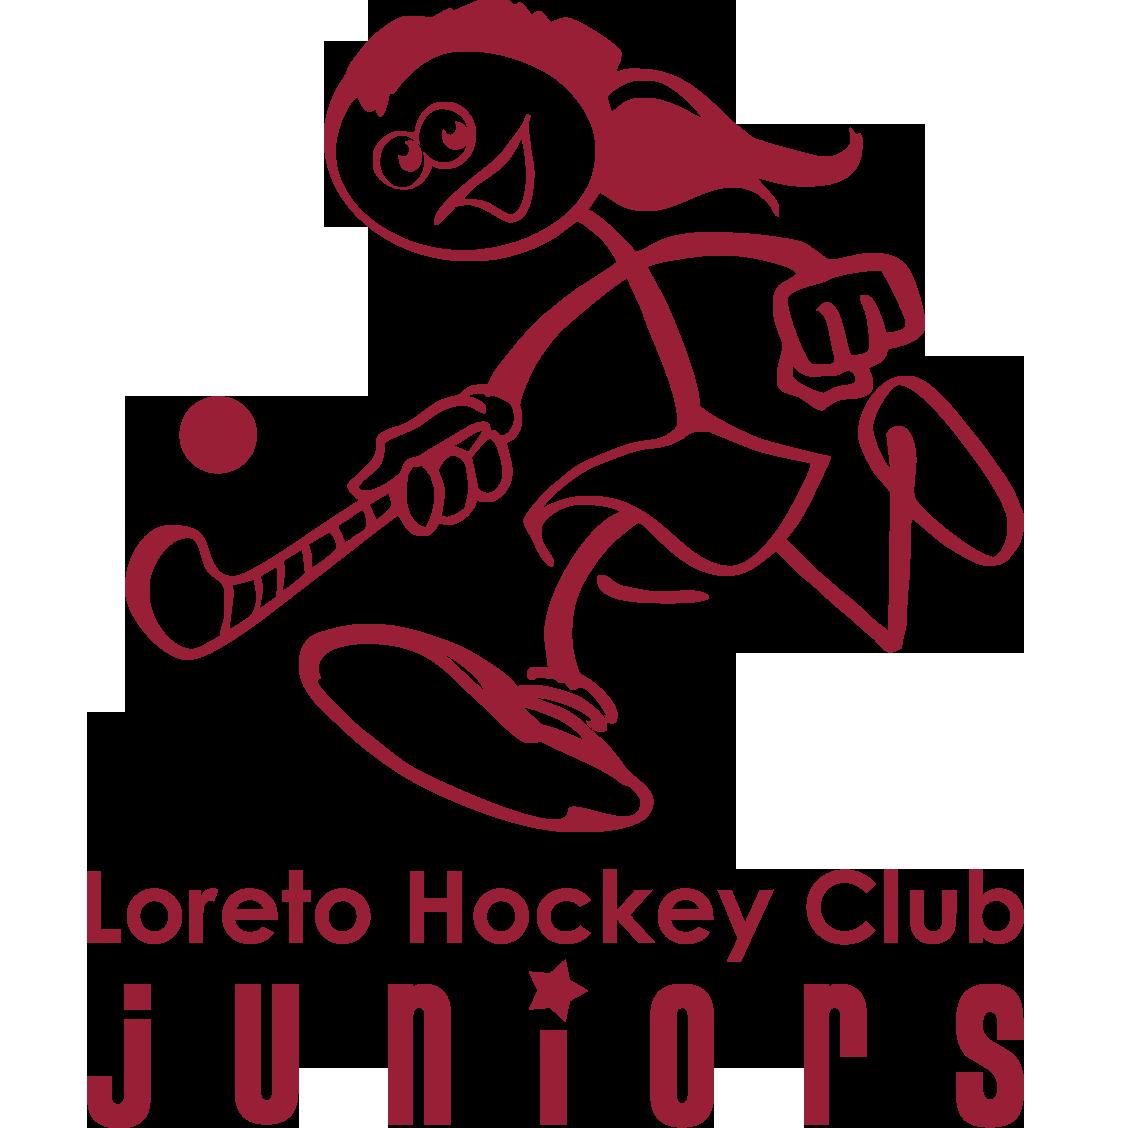 Loreto Hockey Club Juniors